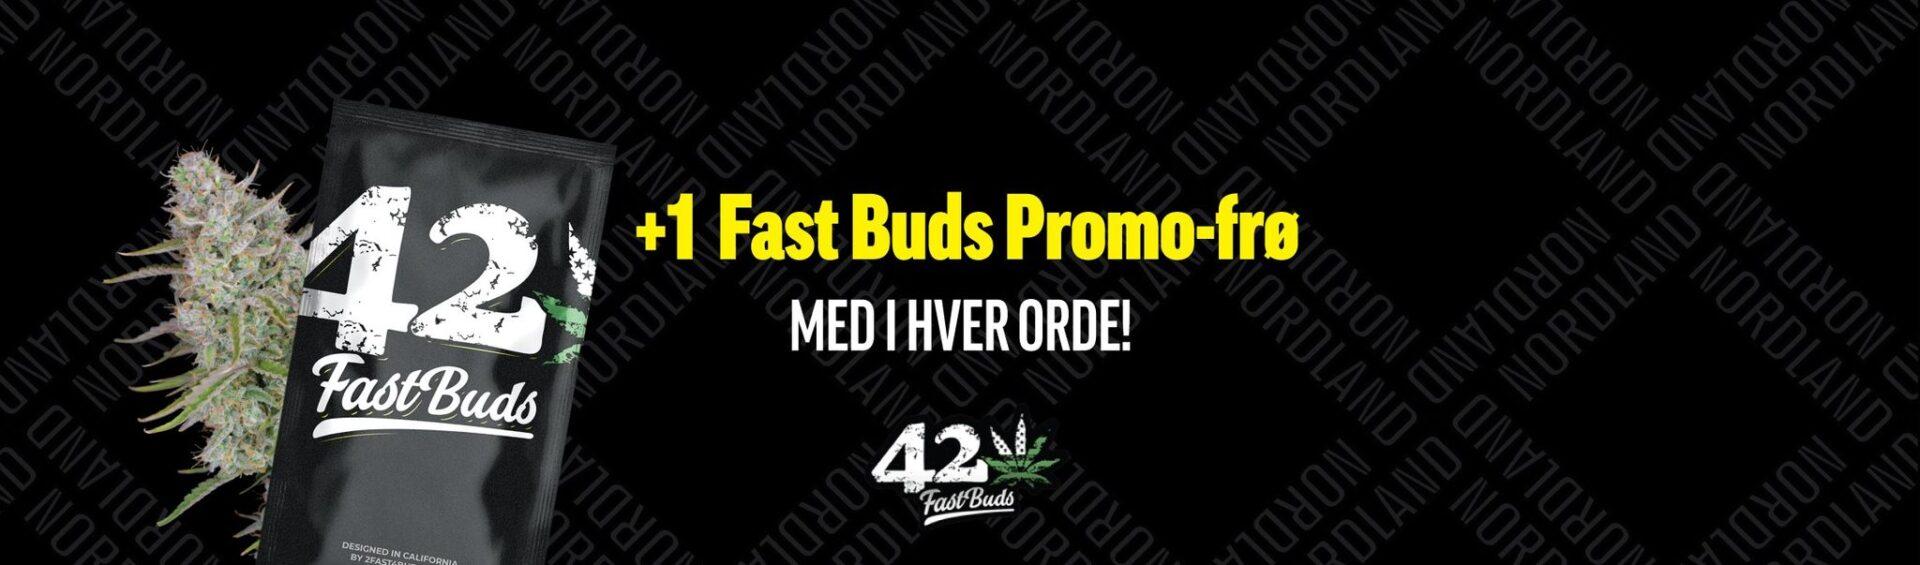 fast buds skunkfrø promo cannabisfrø